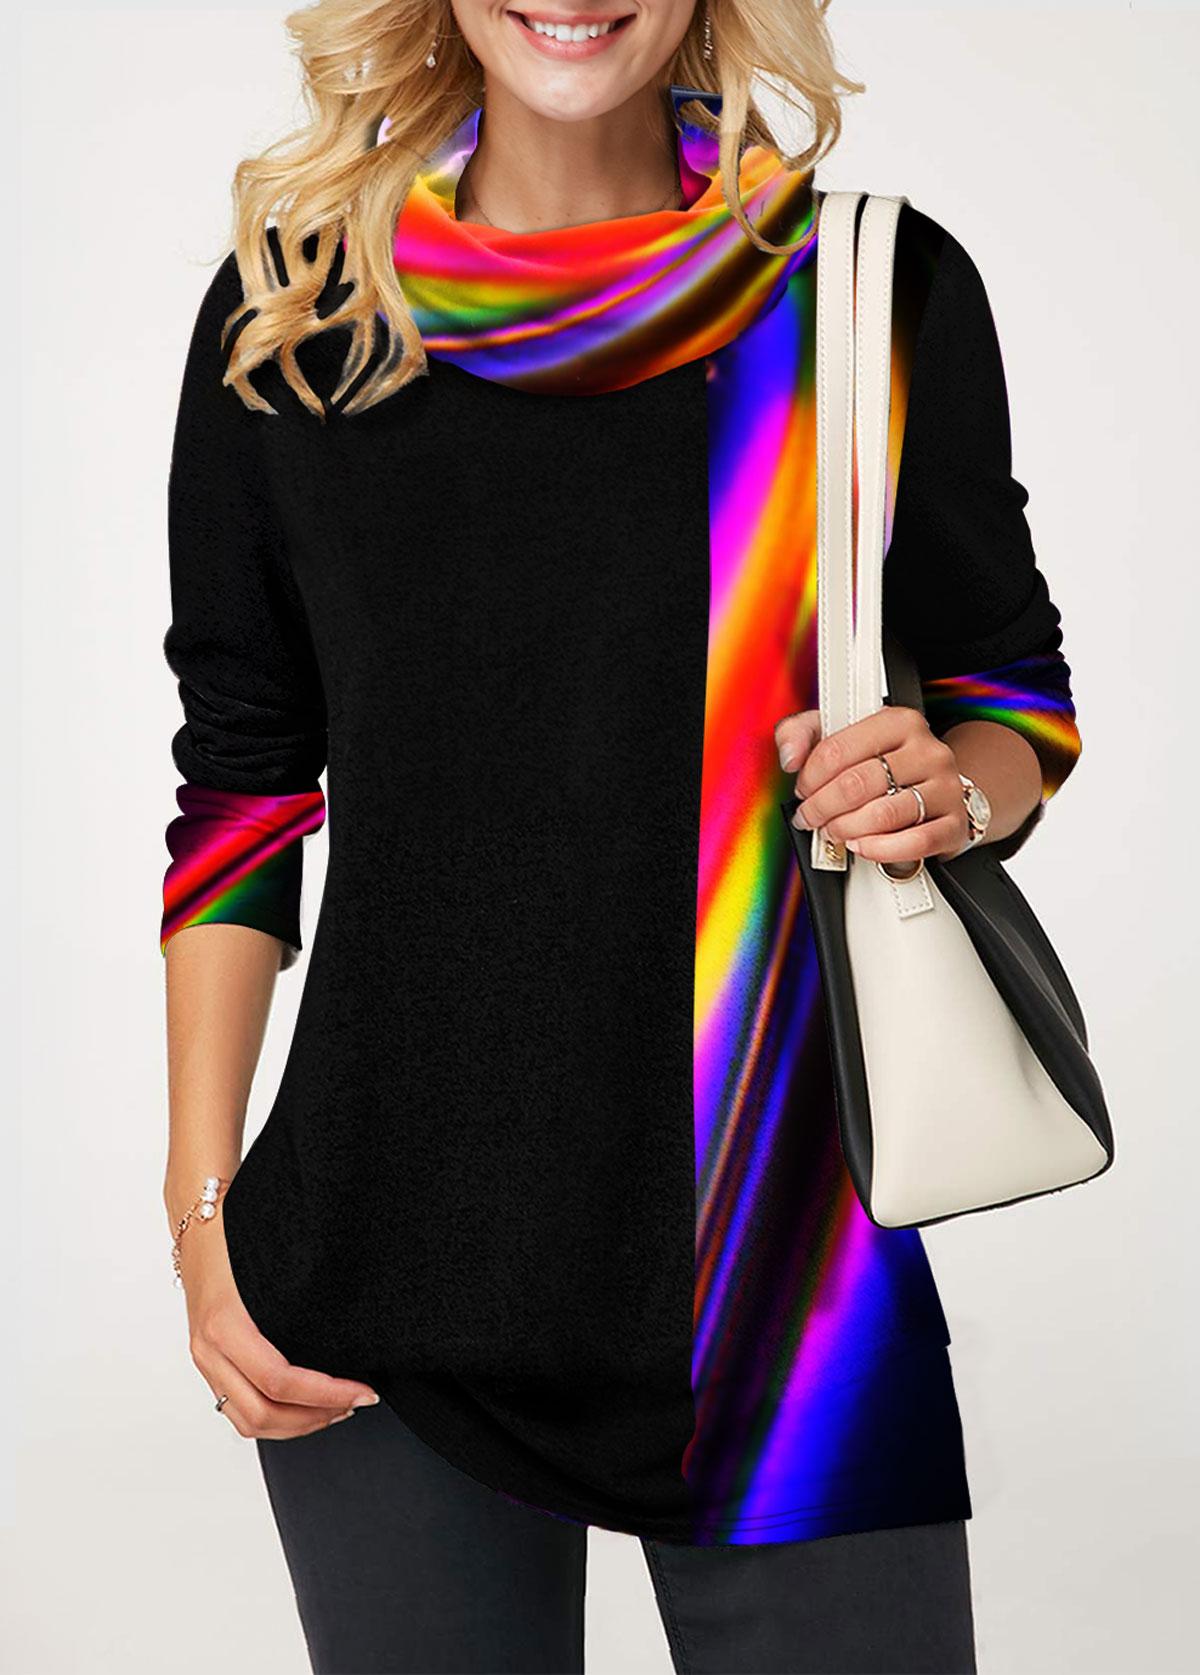 ROTITA Cowl Neck Rainbow Color Geometric Print Tunic Top